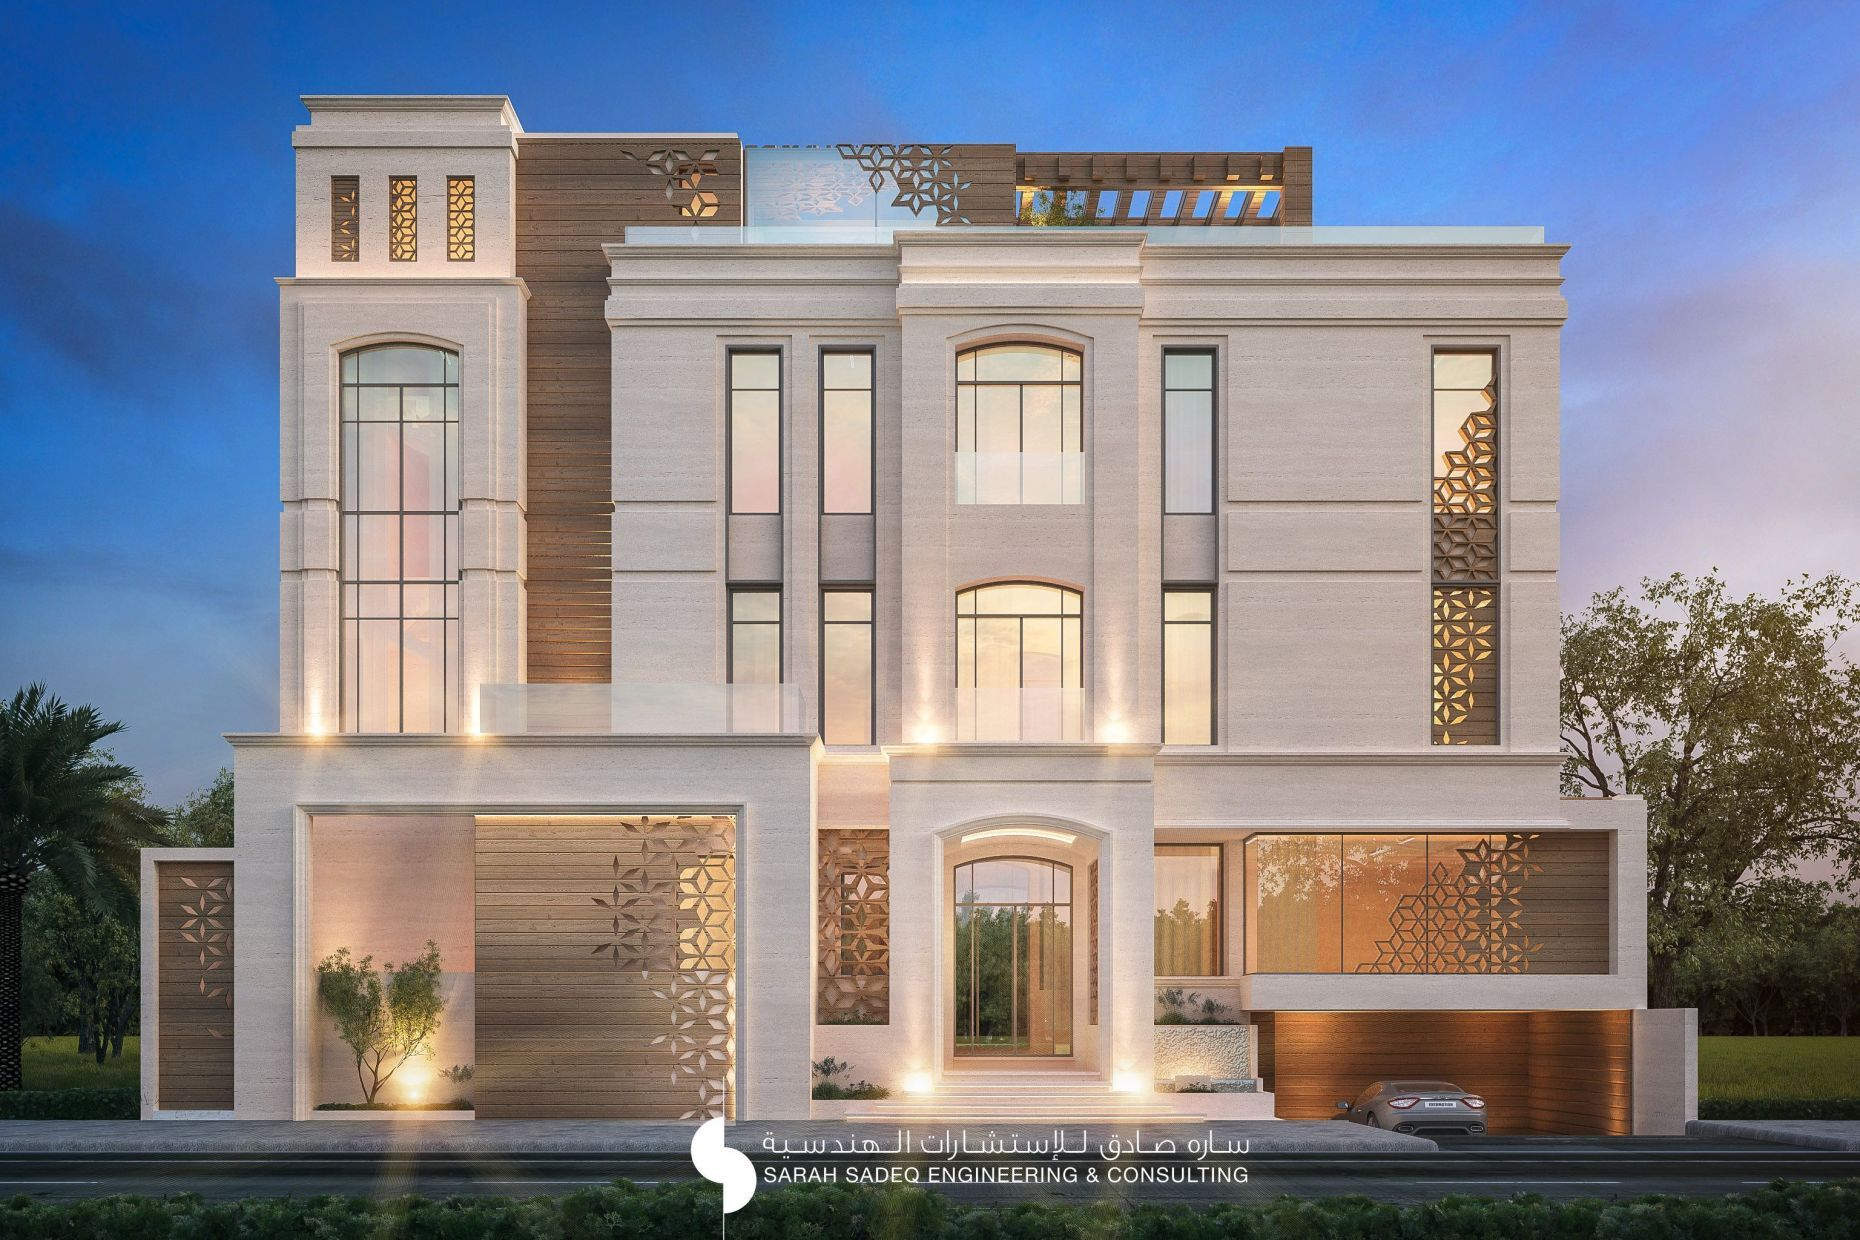 F4c7b99e11f16bd6529eb22c6f03727e Facade House House Designs Exterior Classic House Design